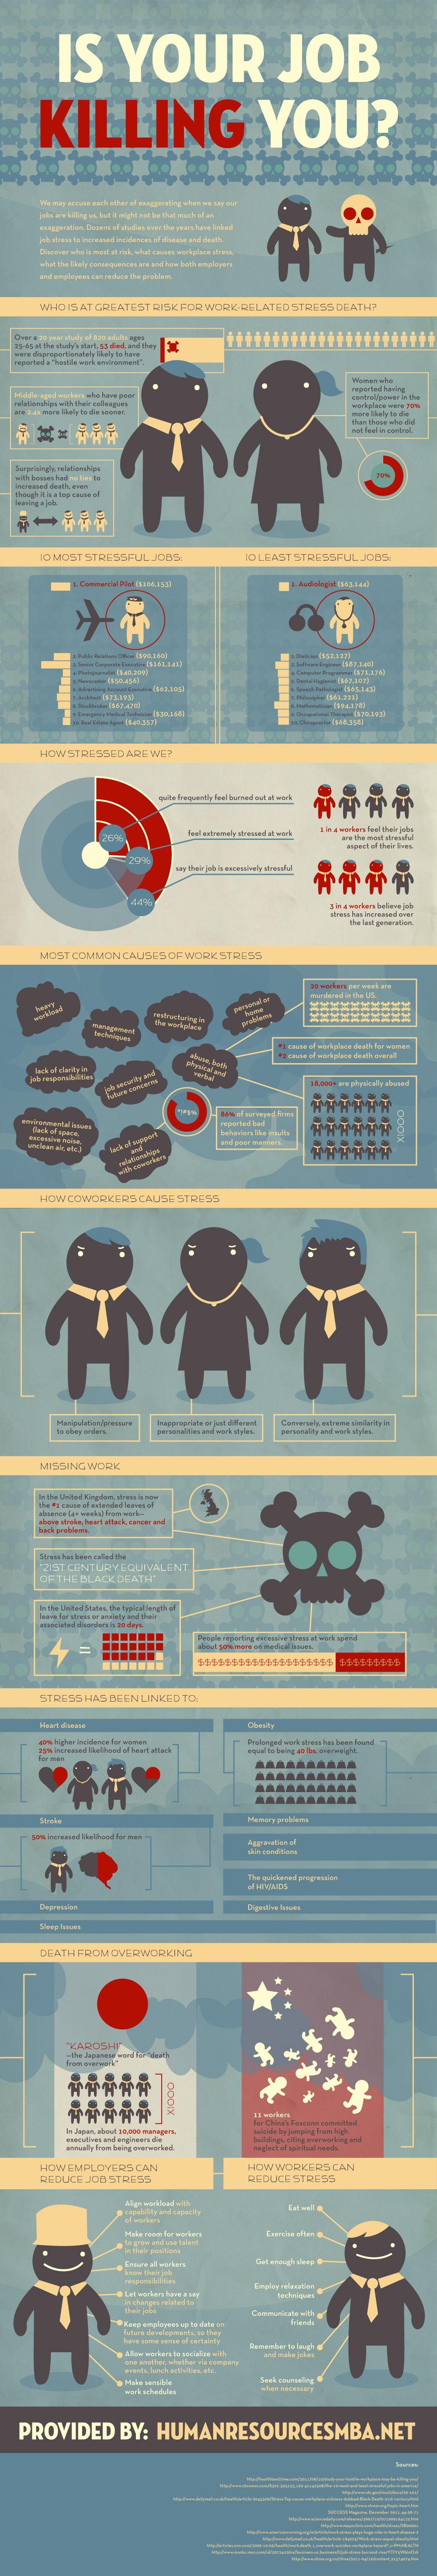 Is Job Stress Killing You?